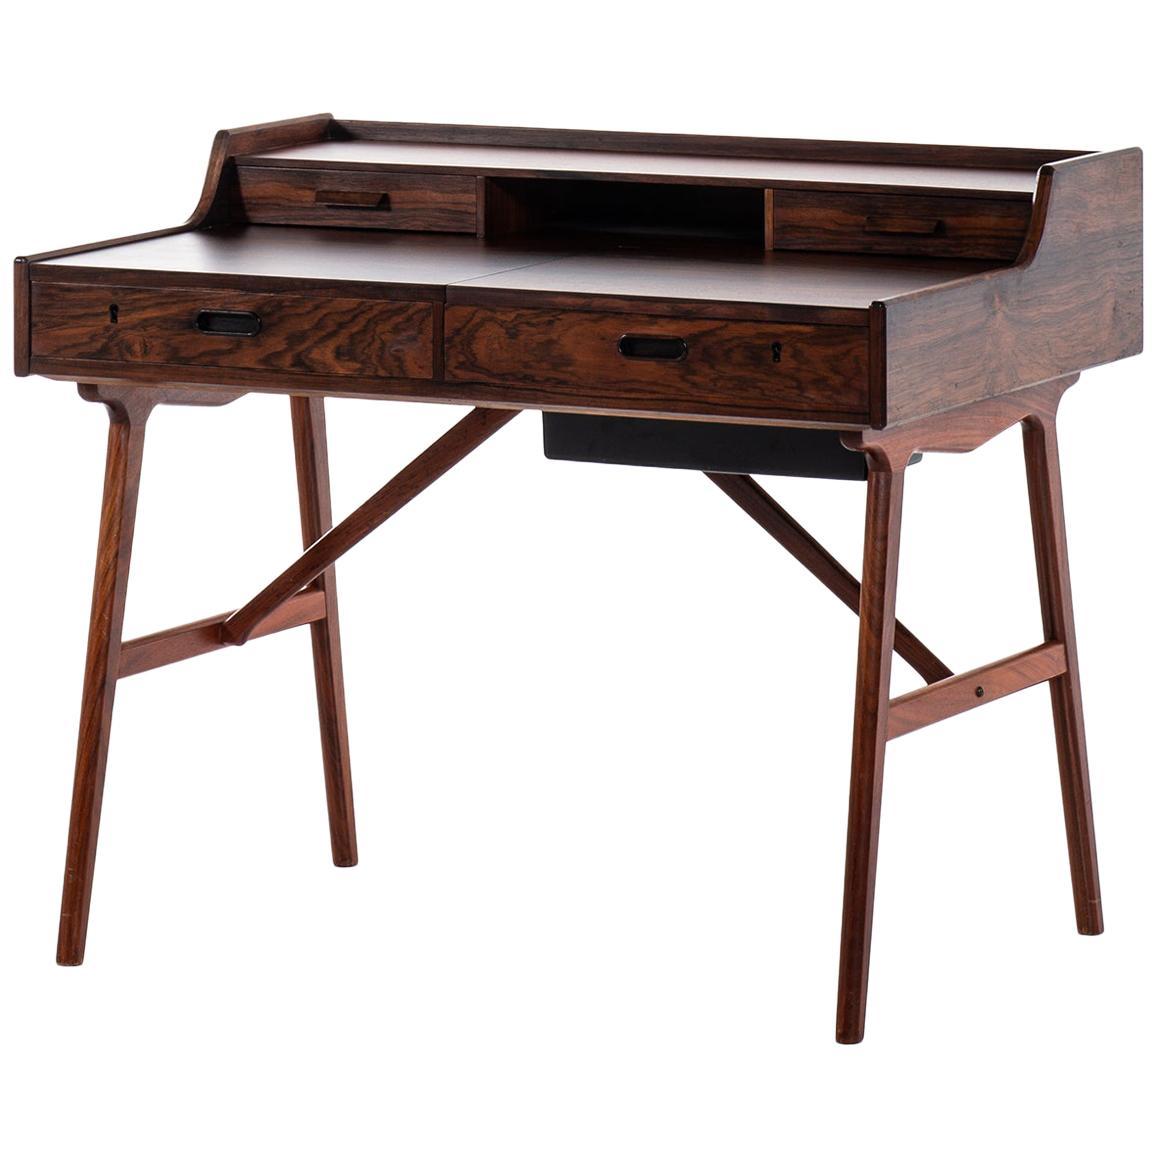 Arne-Wahl Iversen Desk / Vanity Model 65 by Vinde Møbelfabrik in Denmark